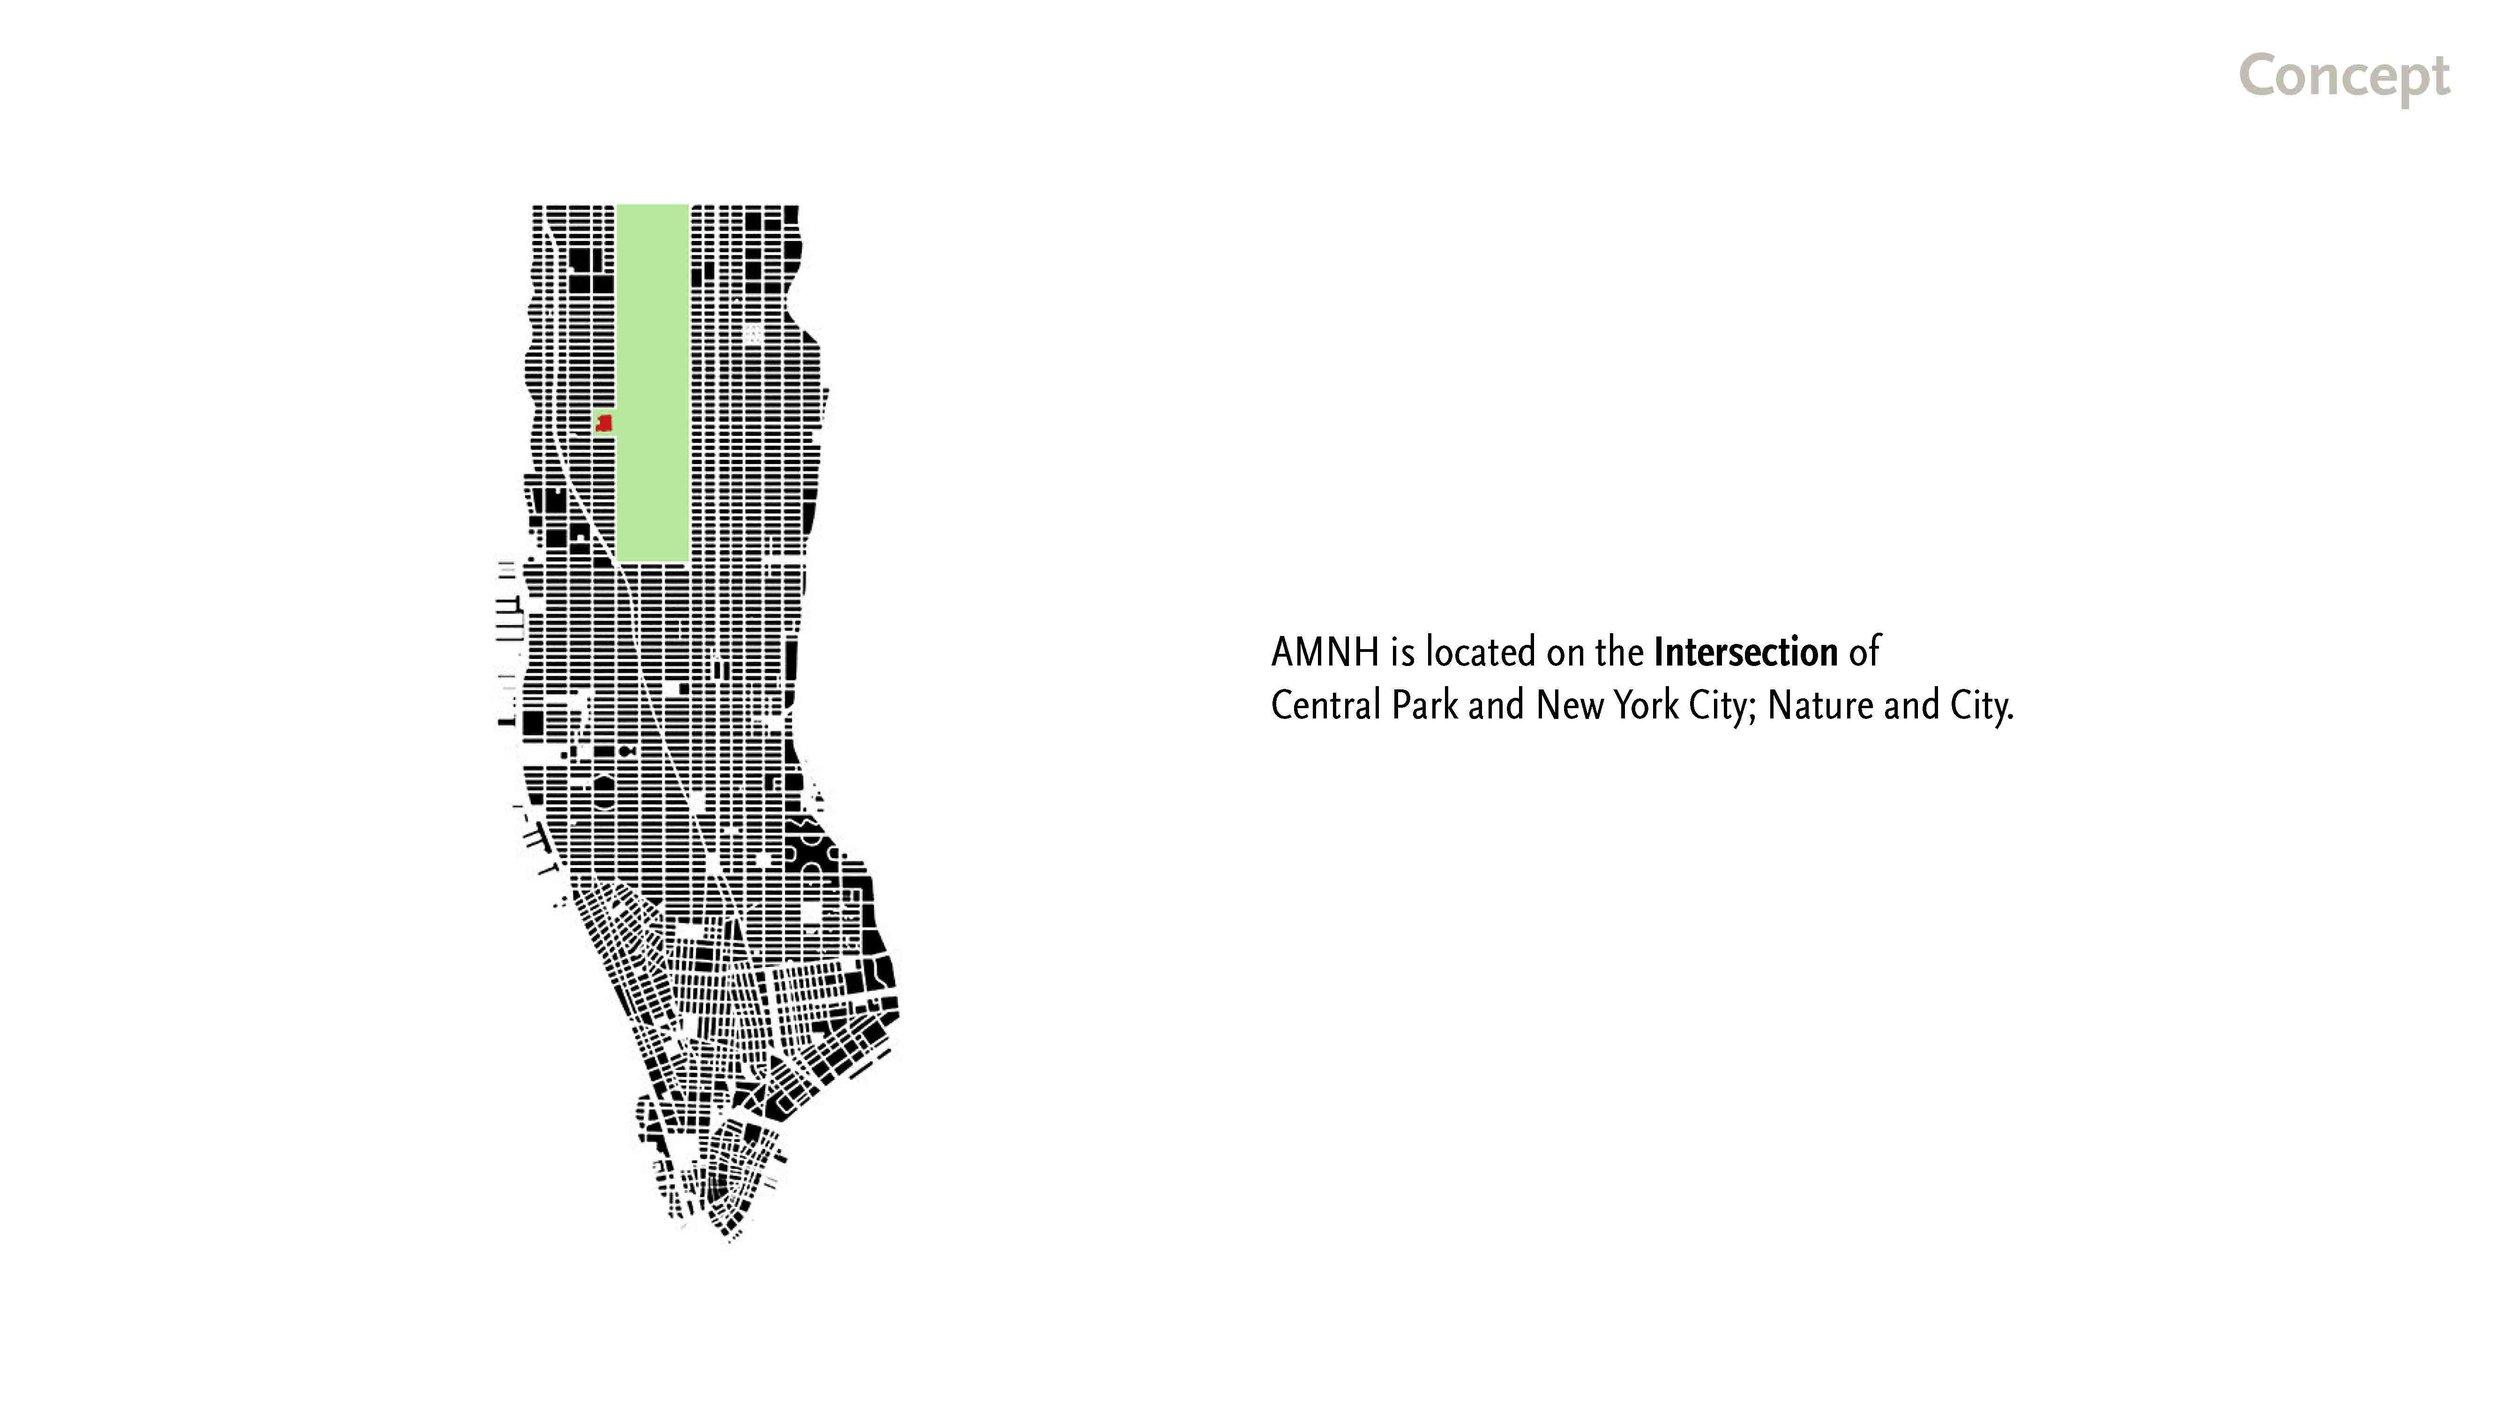 190519 AMNH Final Presentation_Page_06.jpg